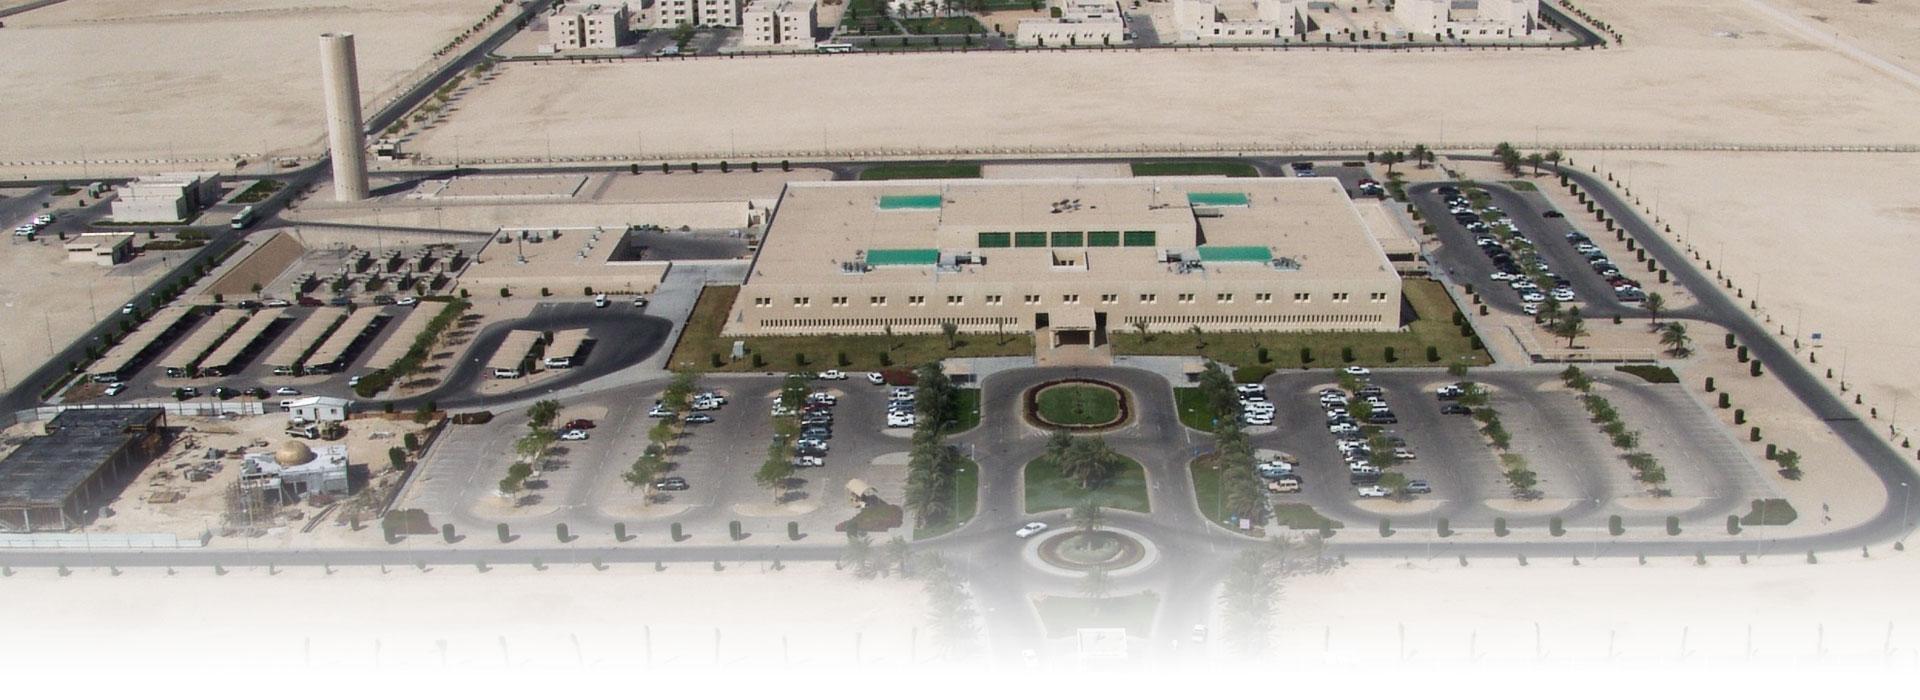 Kingdom of Saudi Arabia Ministry of National Guard-Health Affairs